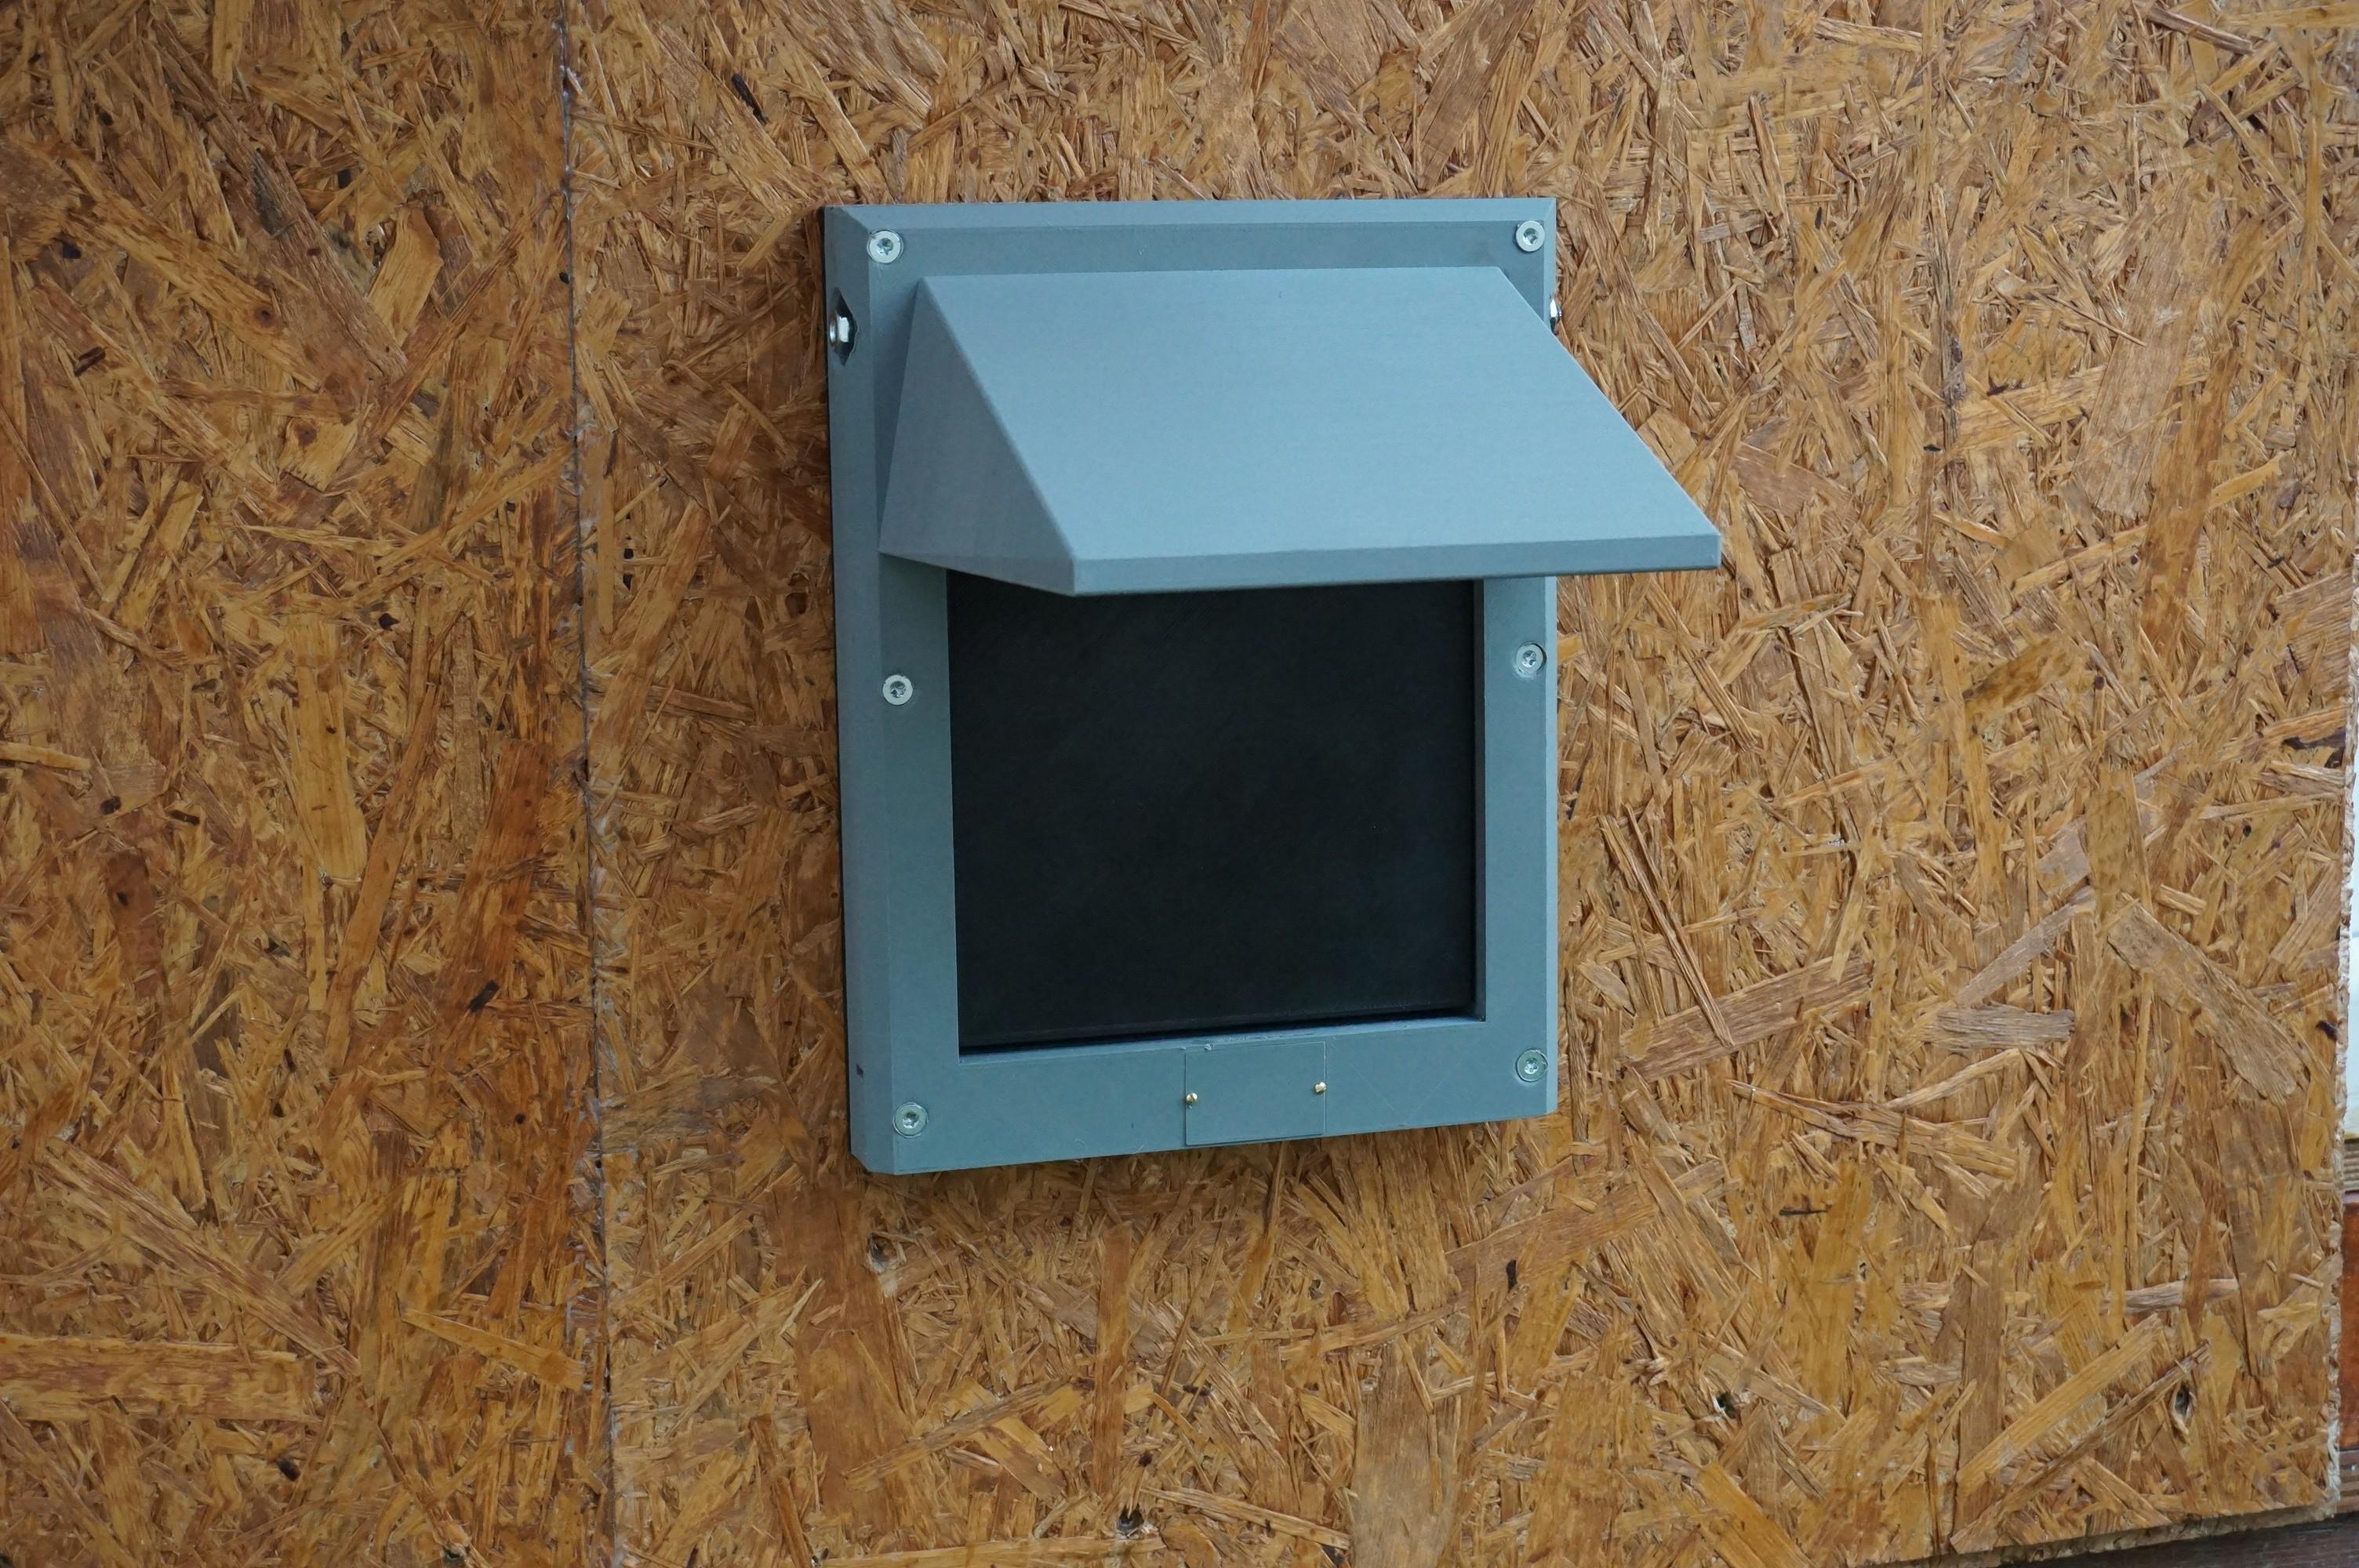 DSC05110.JPG Download free STL file Cat Flap Automatic Door • 3D printing model, Edd77